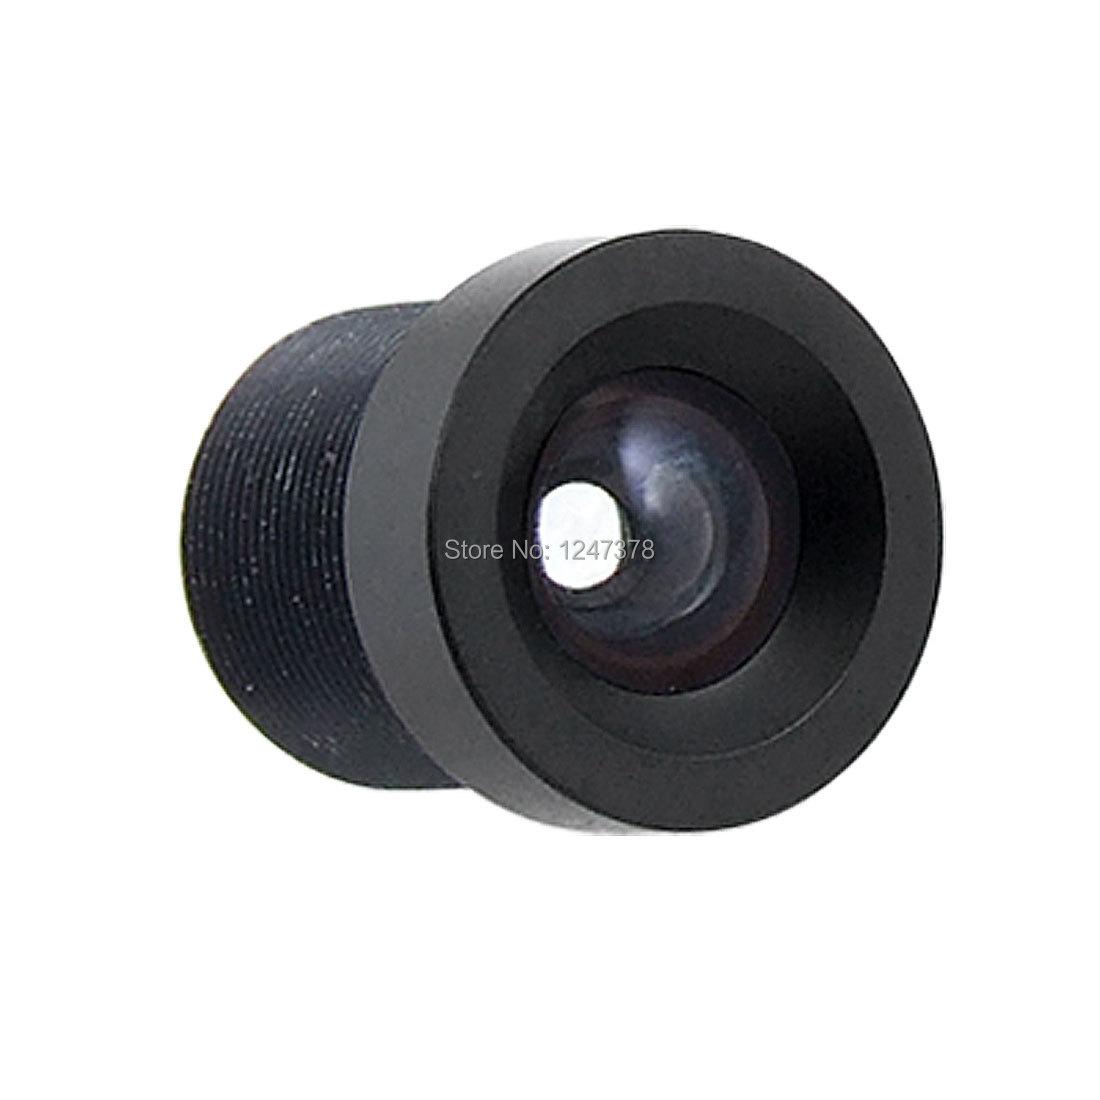 "Гаджет  3.6mm CCTV  Lens 1/3"" F2.0 for Security Camera 92 Wide Angle View  None Безопасность и защита"